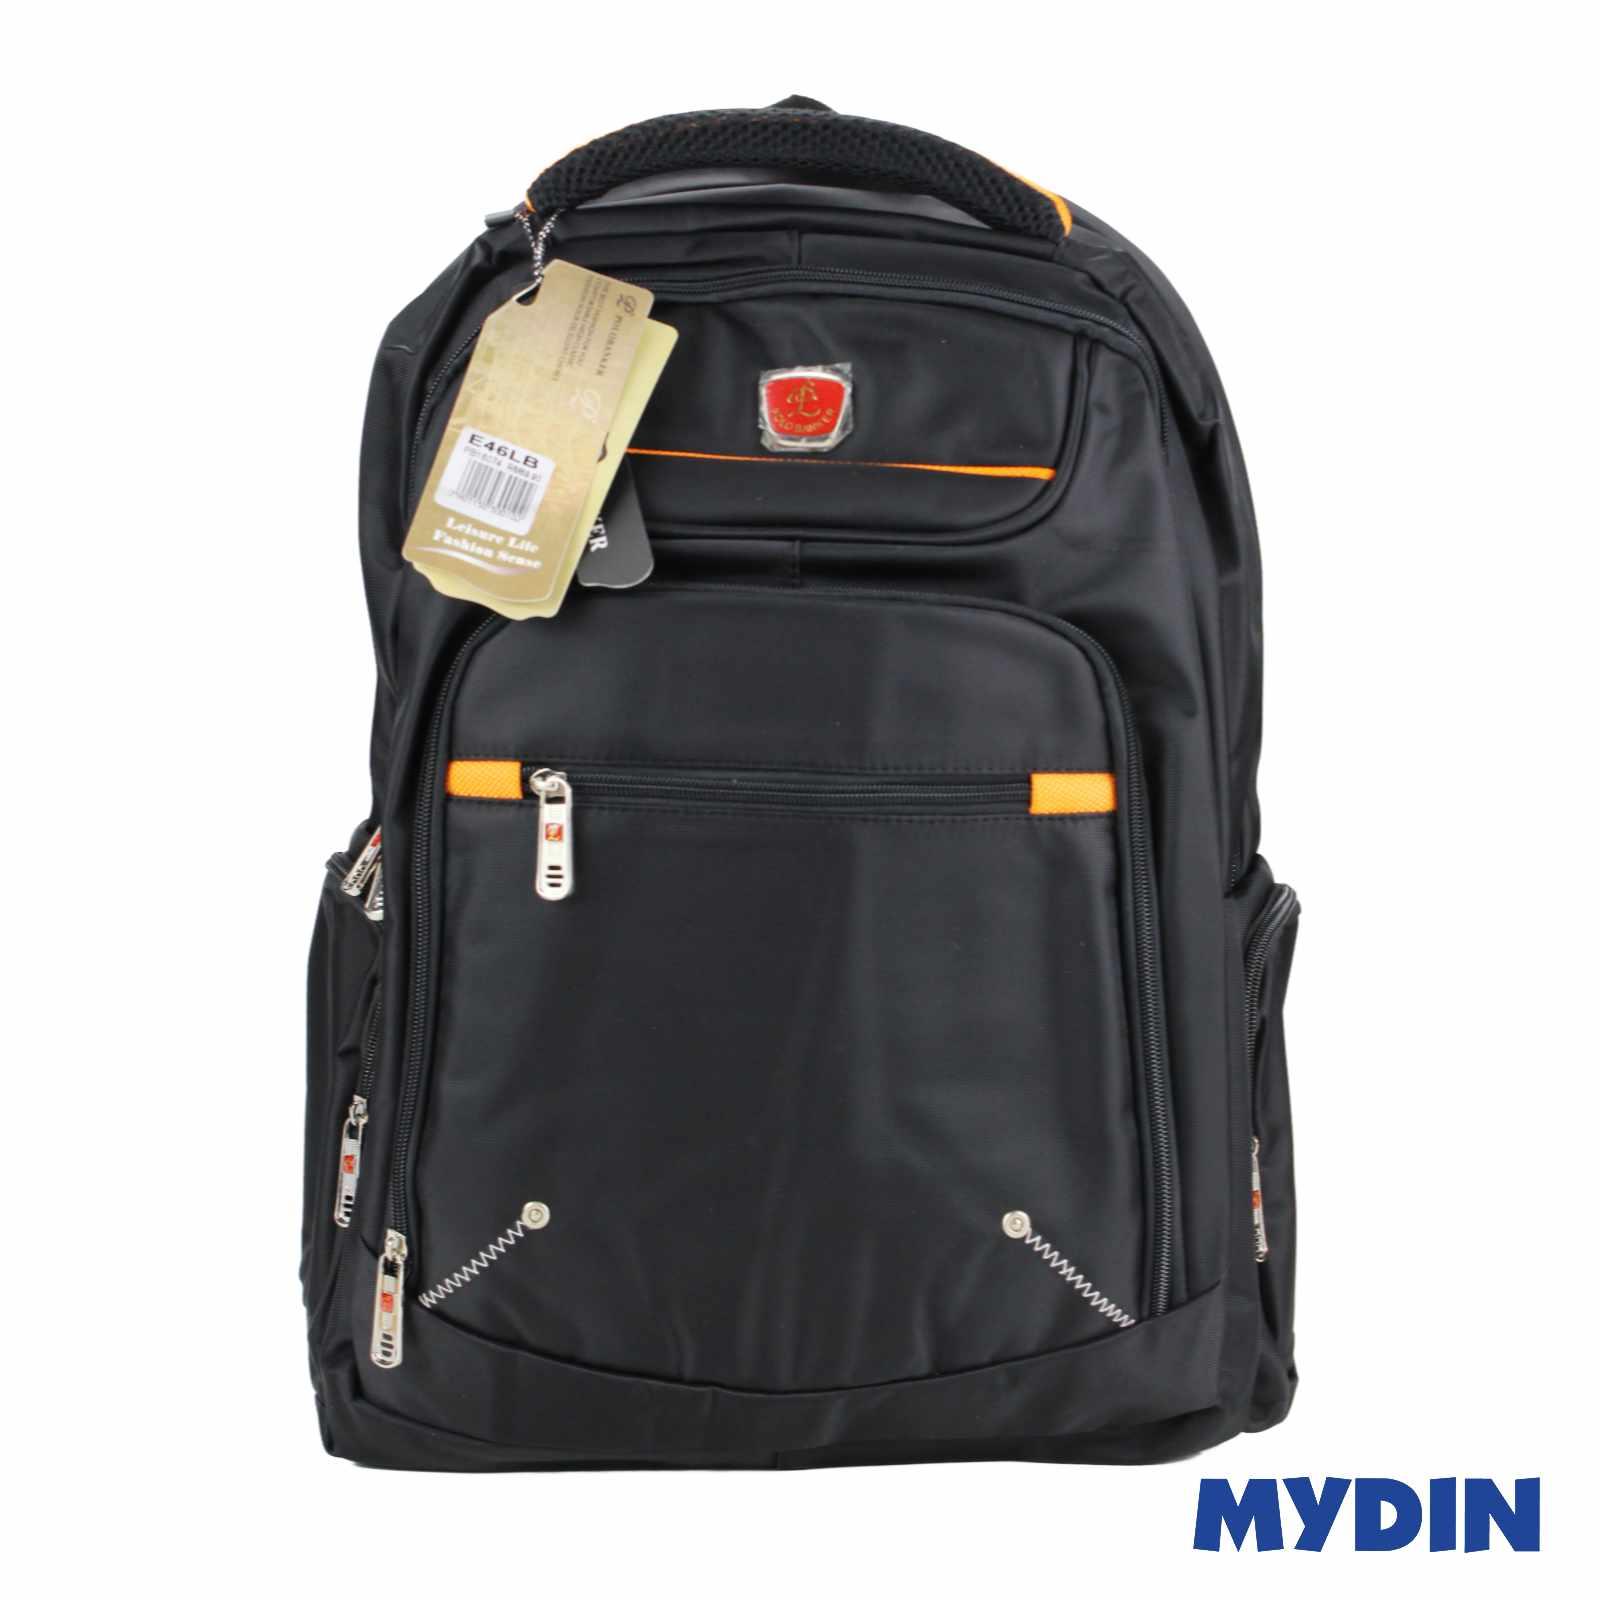 Polo Banker Laptop Haversack Bag 1C E46LB (Black Orange)